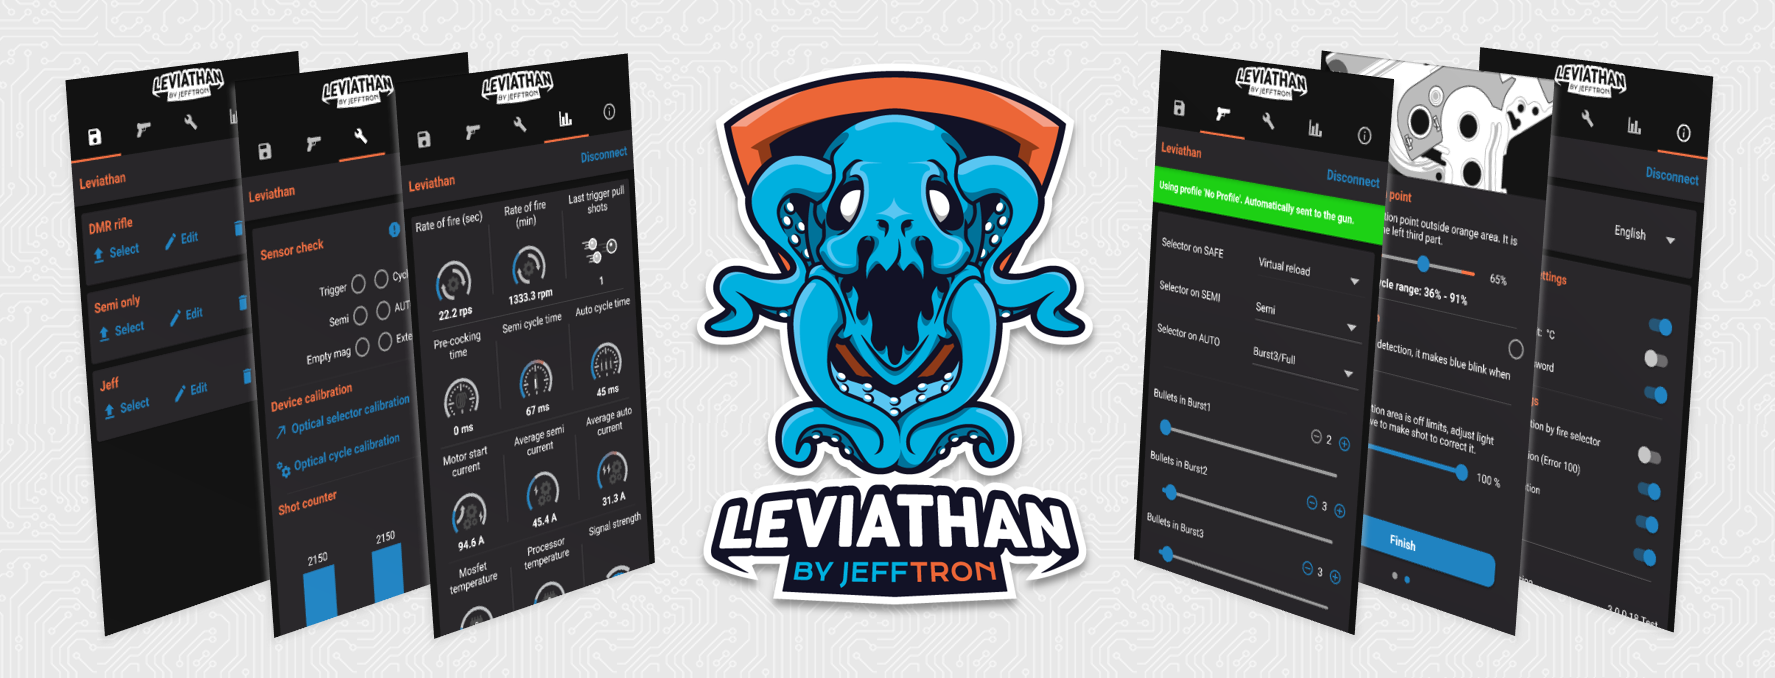 Leviathan banner